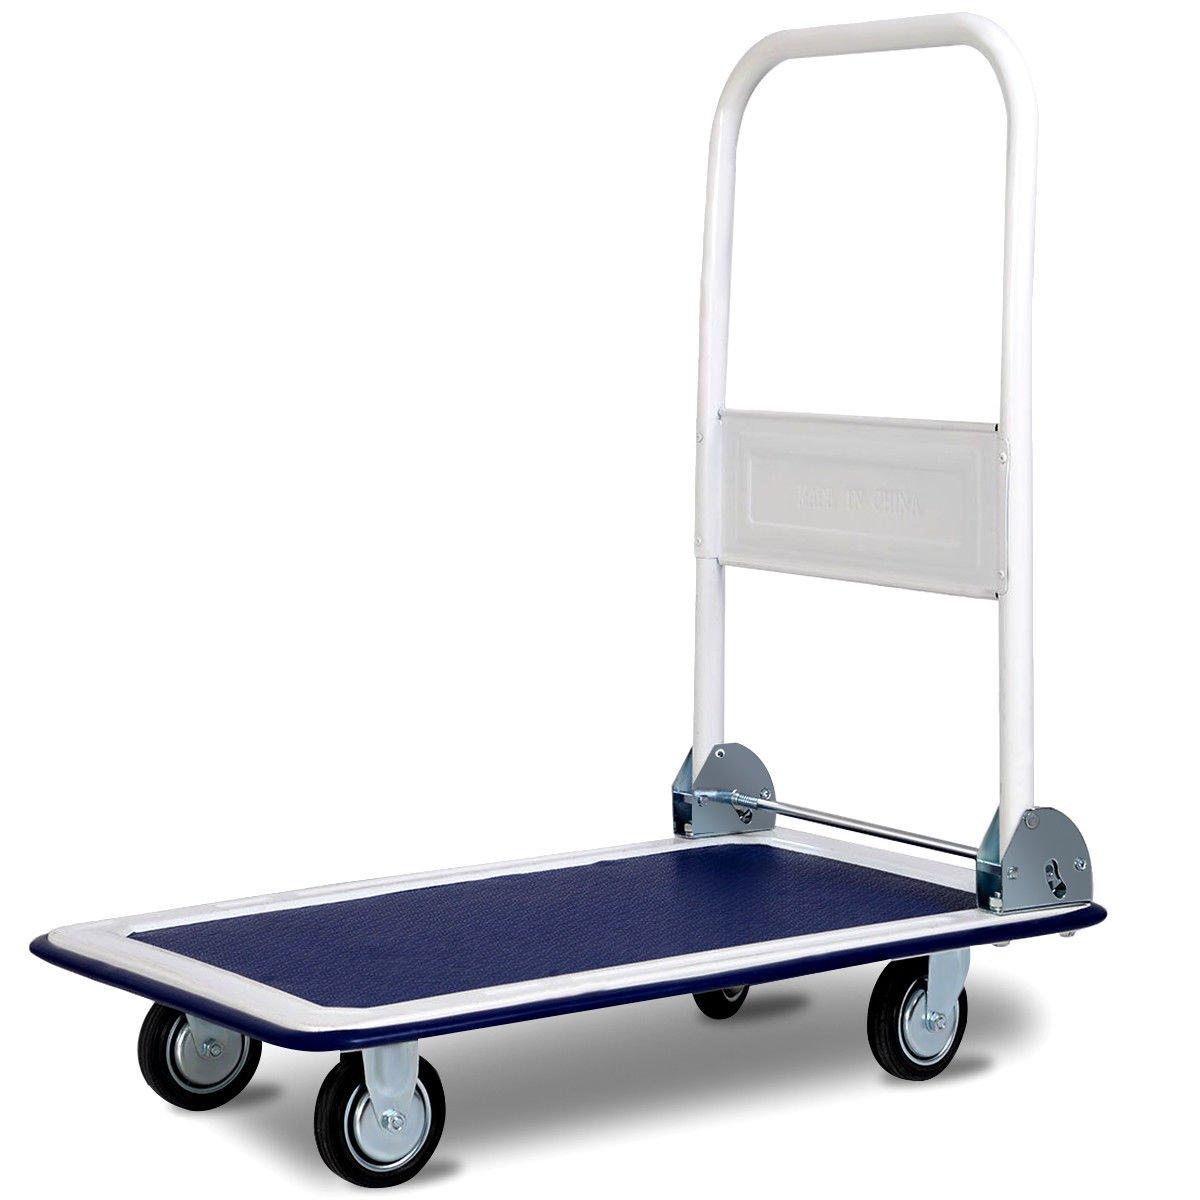 Goplus Folding Platform Cart 330LBS Rolling Flatbed Cart Hand Platform Truck Push Dolly for Loading